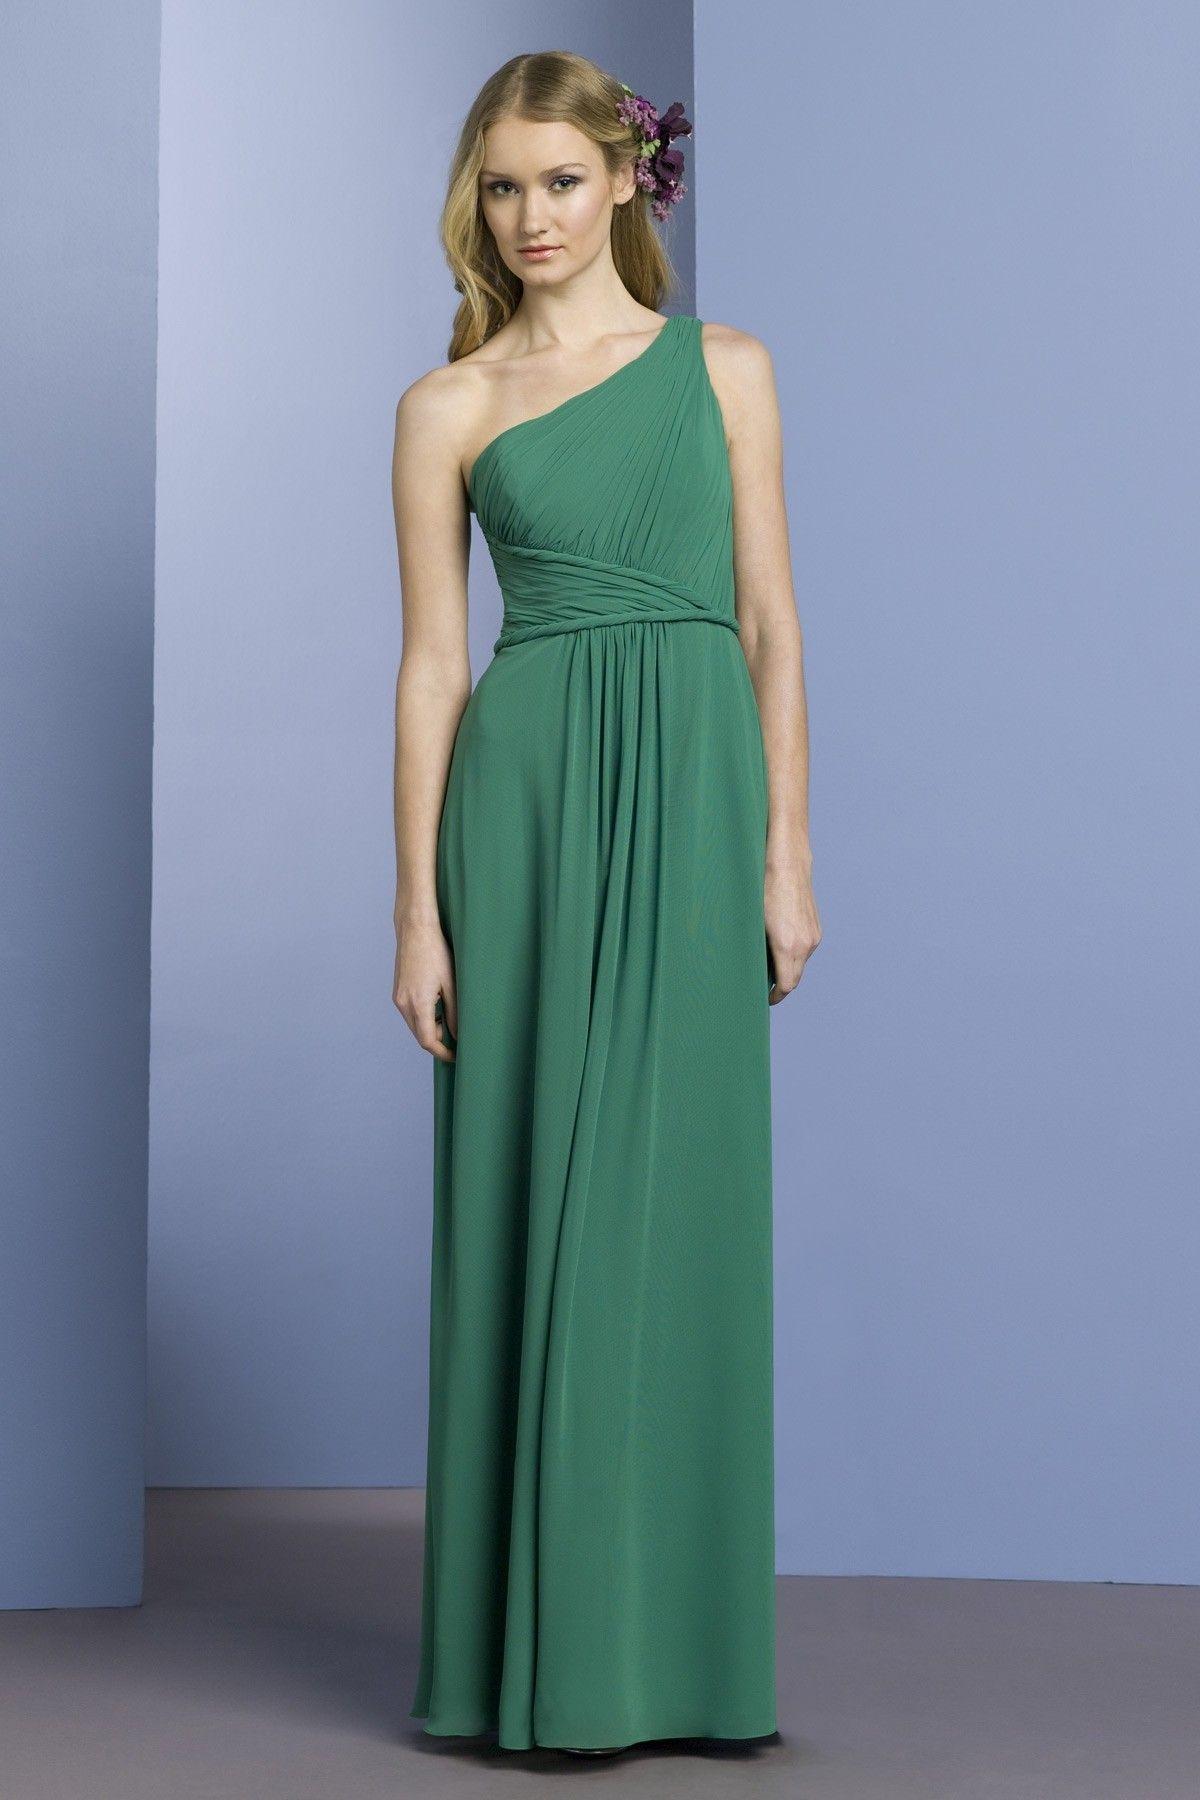 be7f05b421 Liz Fields 305 Emerald Chiffon One-Shoulder Twisted Grecian Prom Gowns